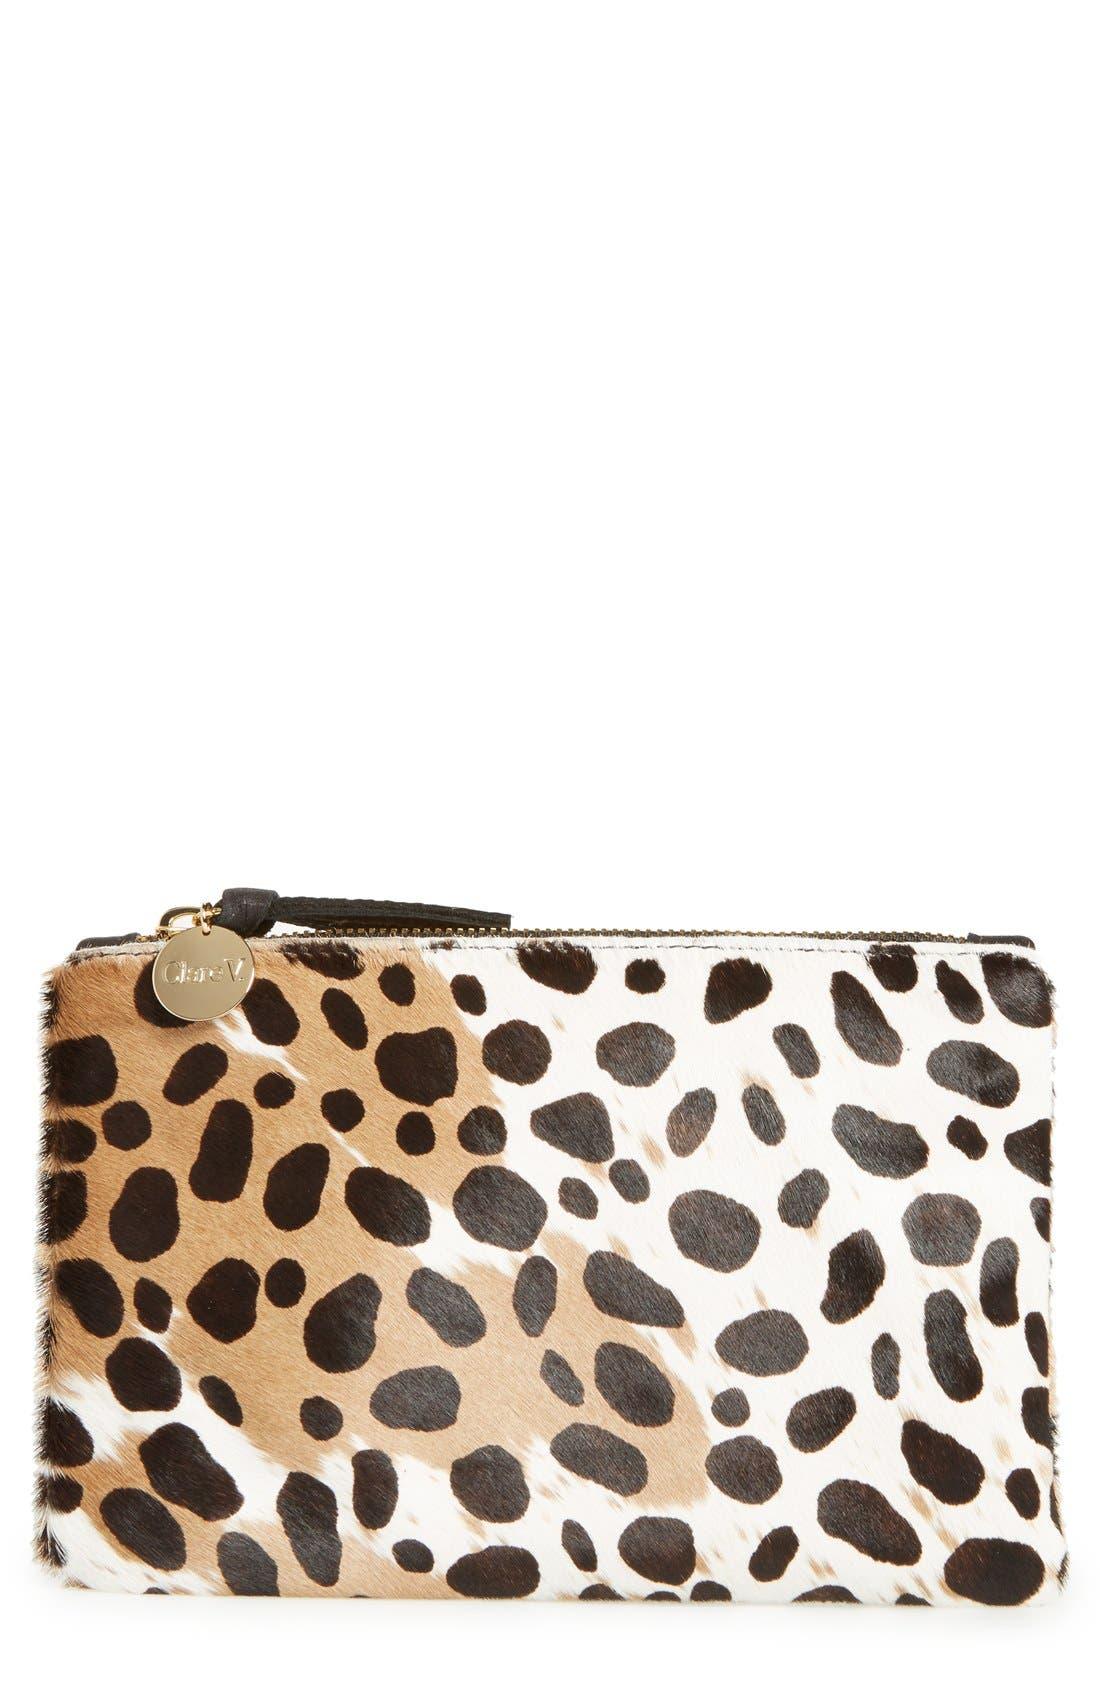 'Core' Leopard Print Genuine Calf Hair Pouch,                             Main thumbnail 1, color,                             Leopard